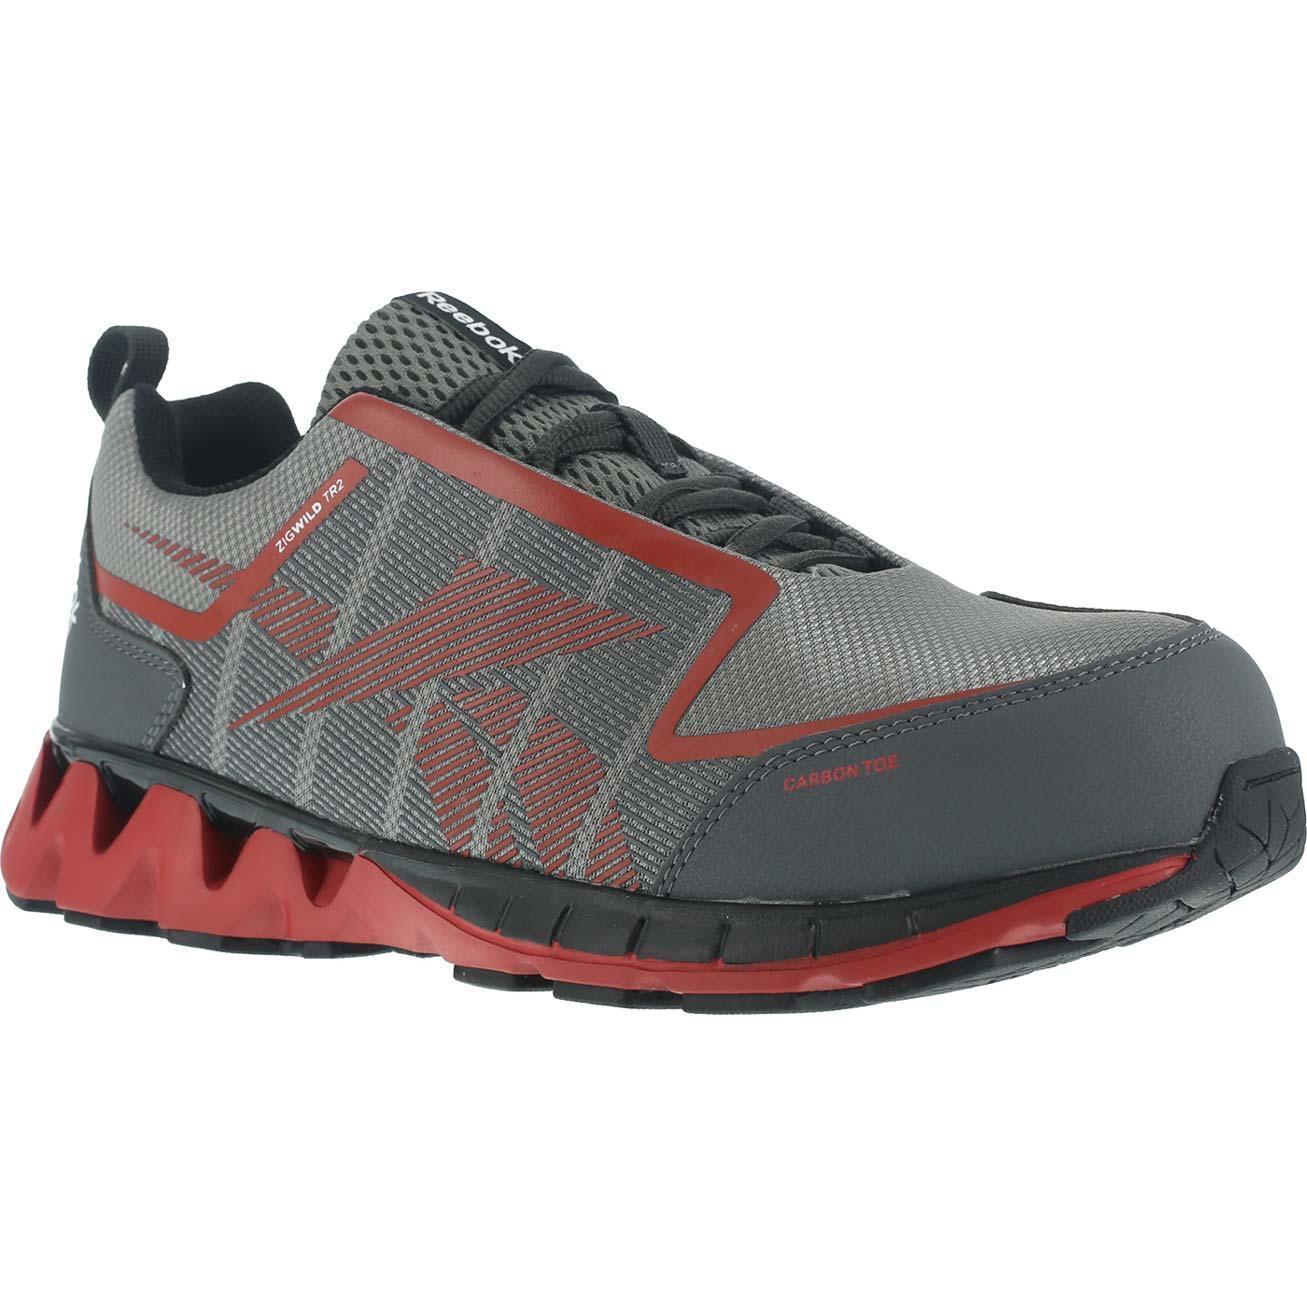 pretty nice 59909 82bd4 ... discount code for reebok zigwild tr2 work carbon fiber toe static  dissipative work athletic trail runner